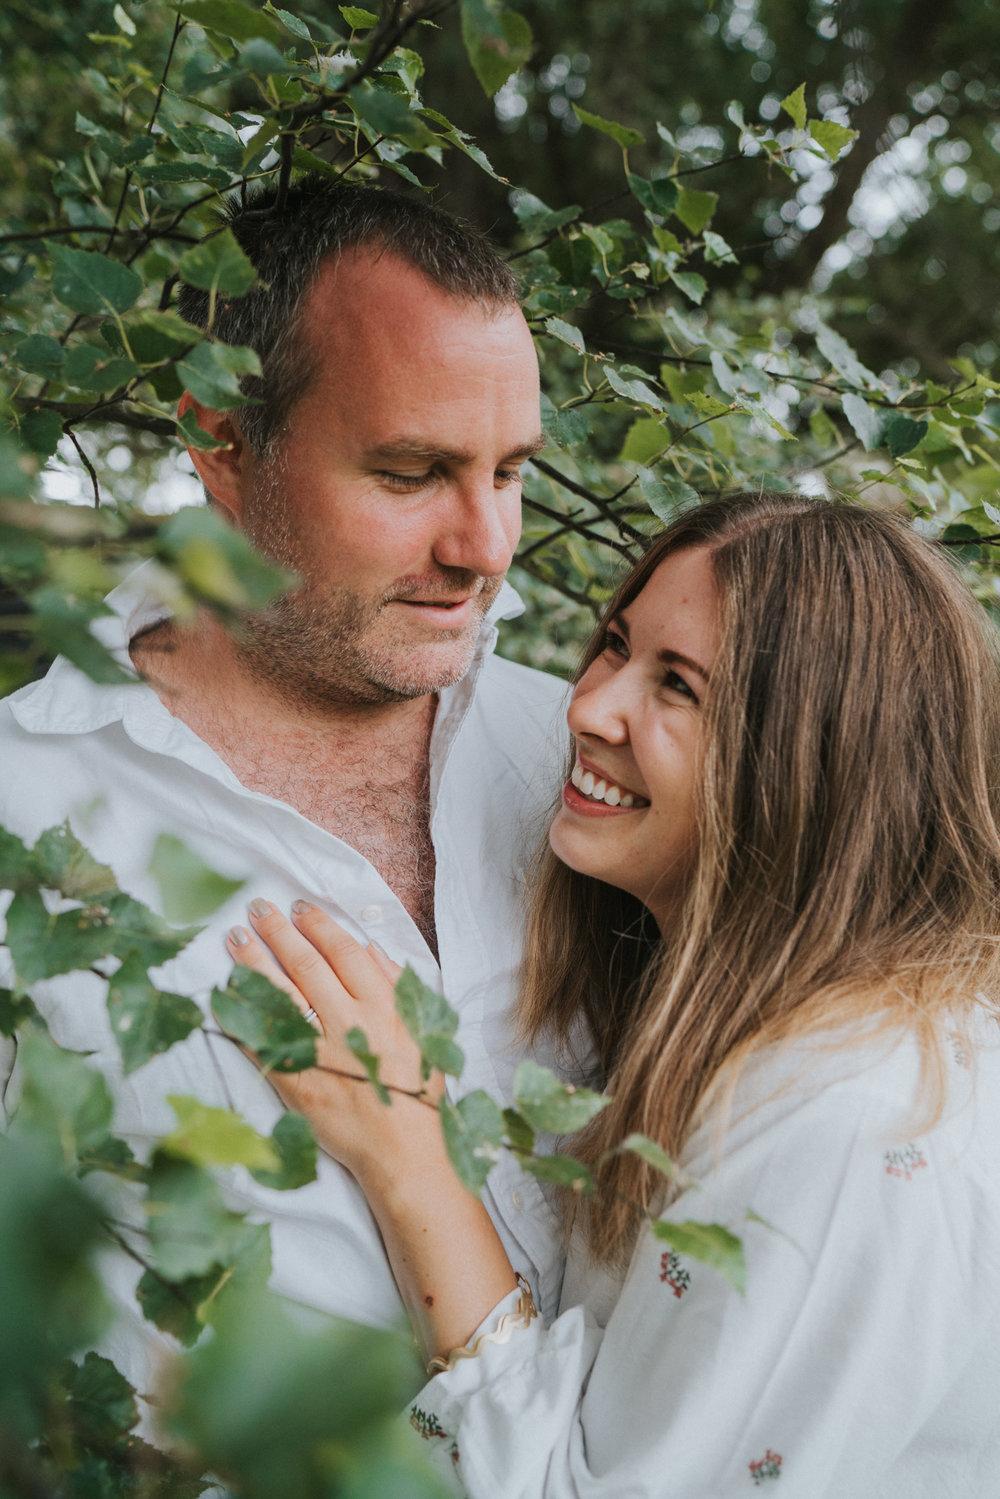 Parkers-Extended-Family-Session-Grace-Elizabeth-Alternative-Wedding-Lifestyle-Photographer-Colchester-Essex-Norfolk-Suffolk-Devon (7 of 62).jpg